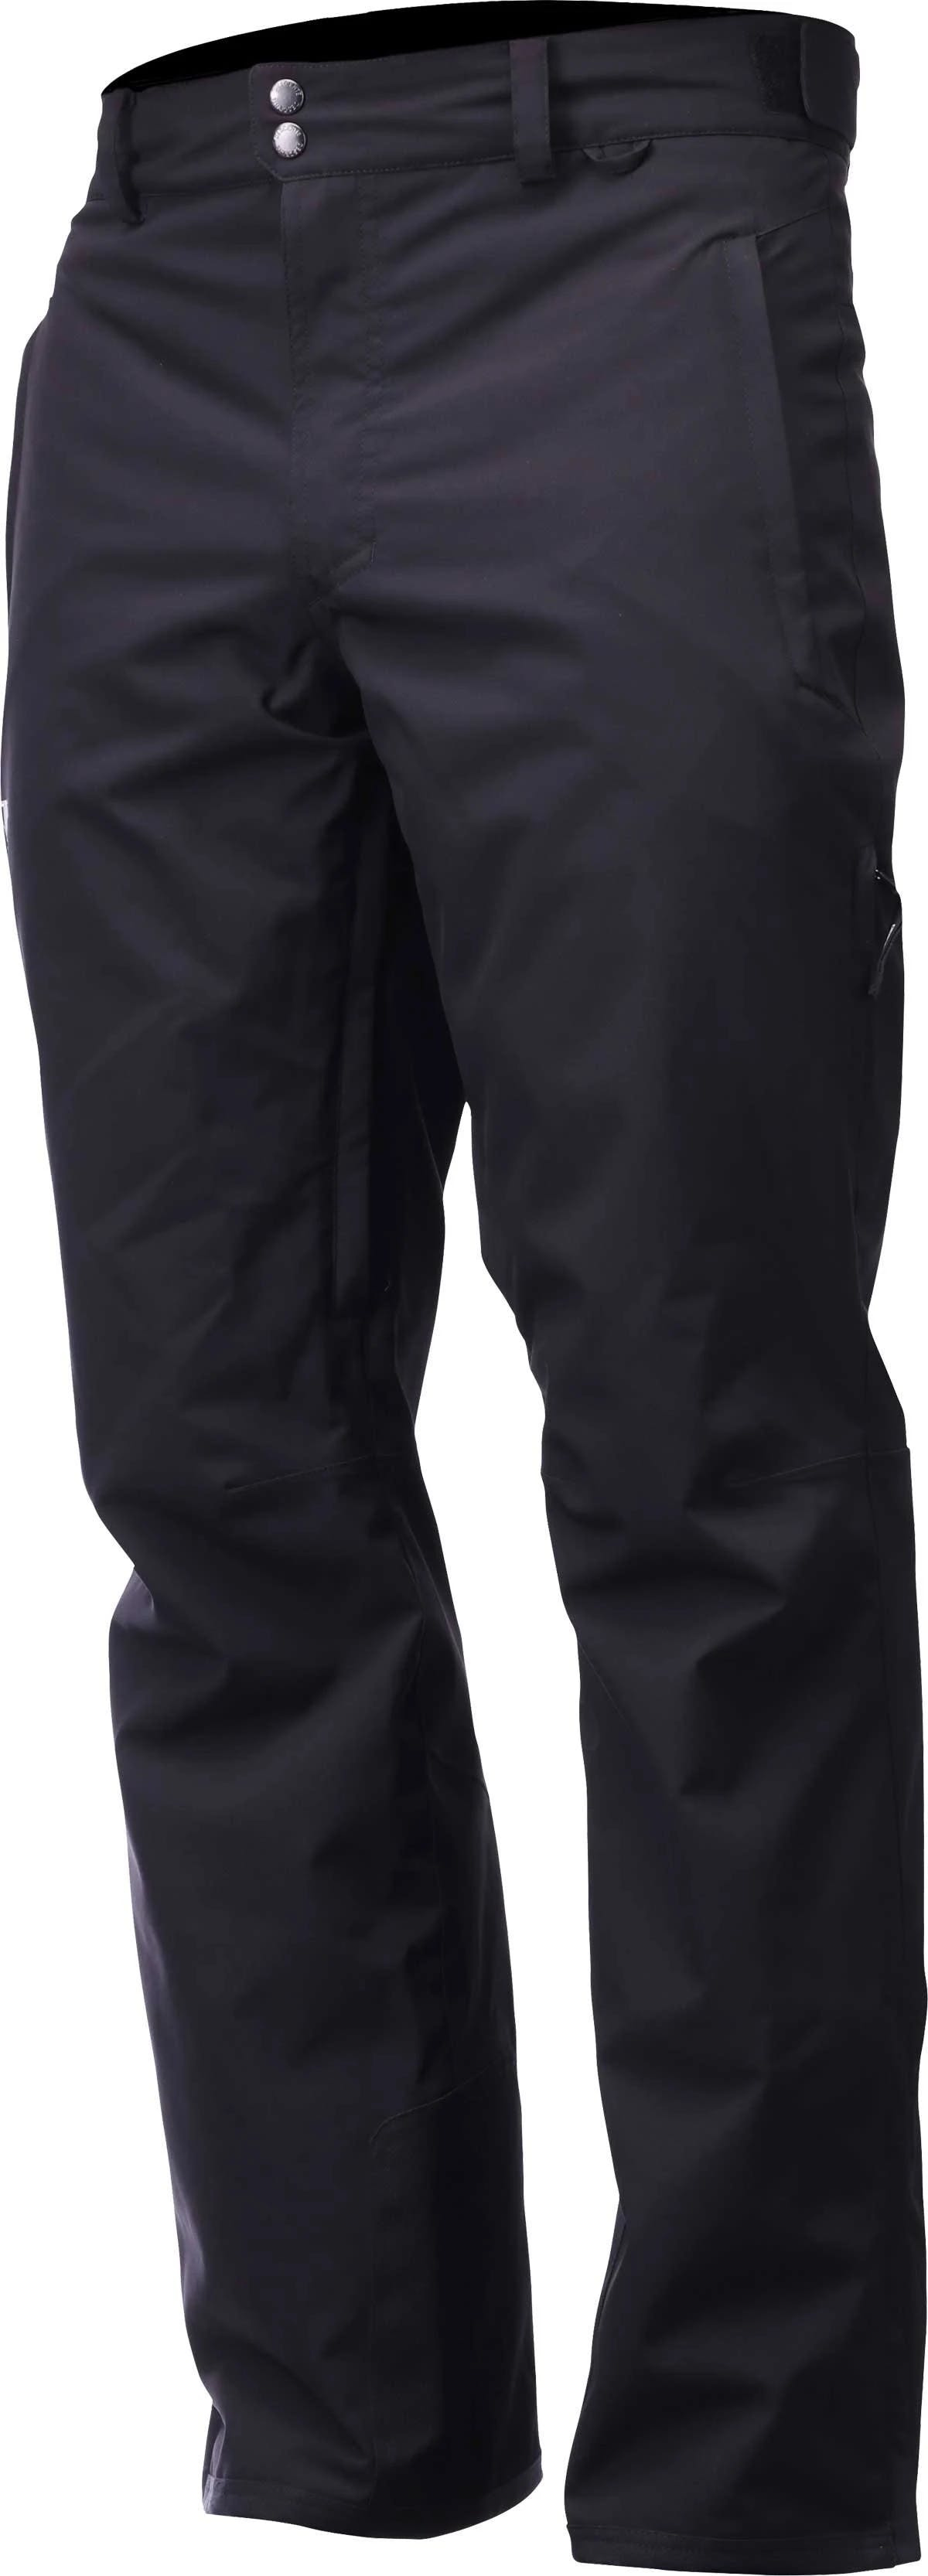 Descente Greyhawk Insulated Ski Pant Mens Black